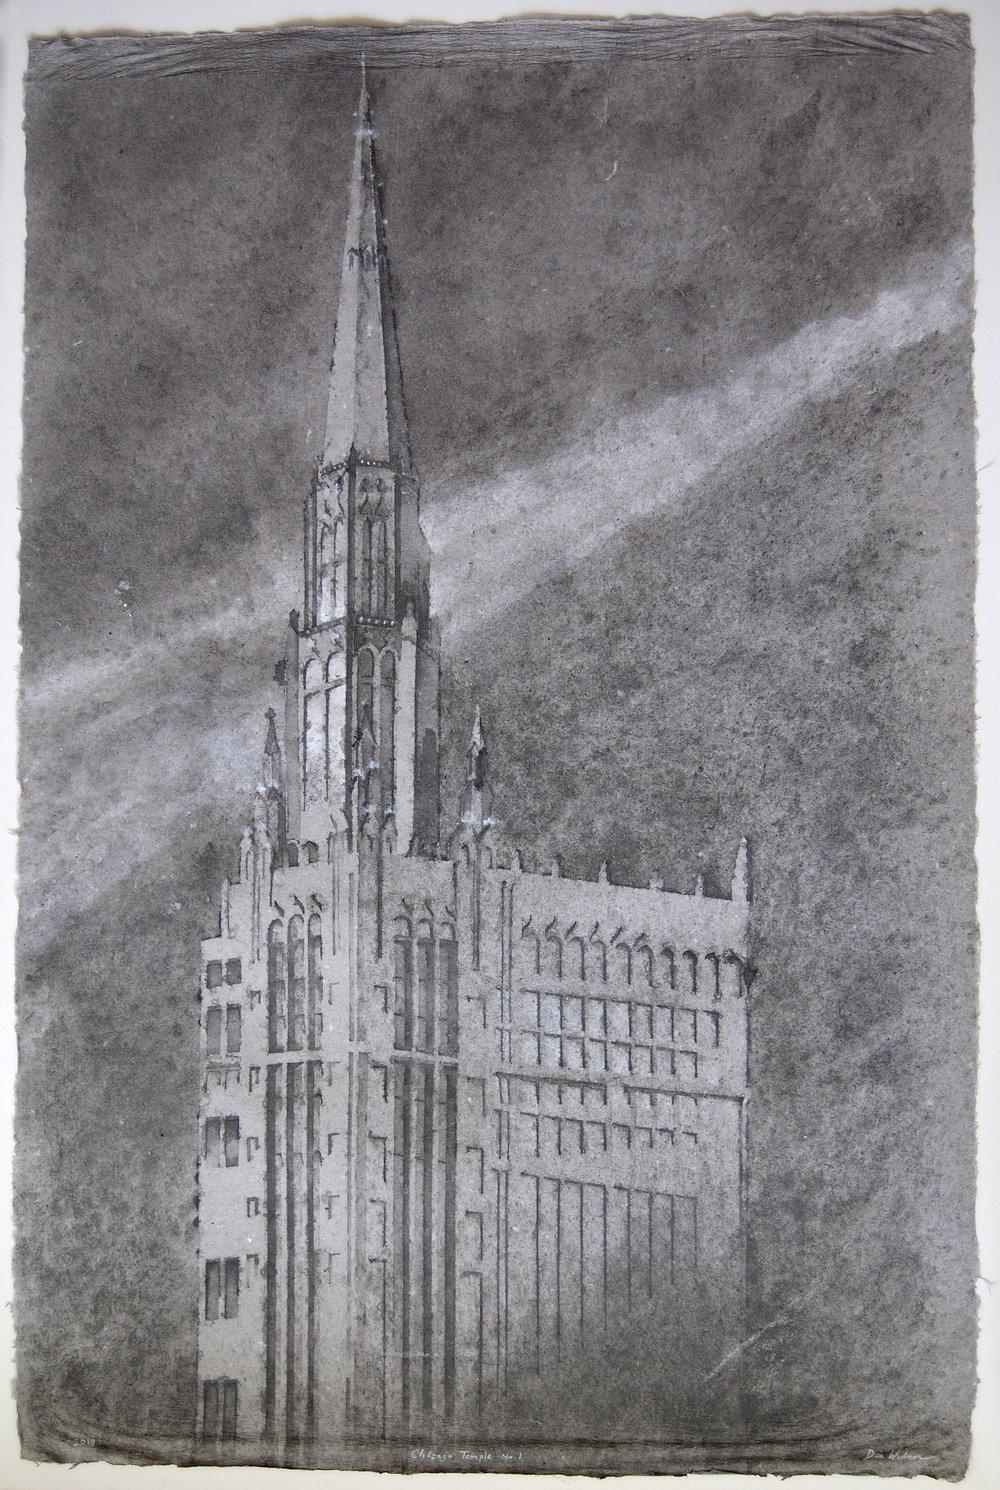 Chicago Temple No. 1